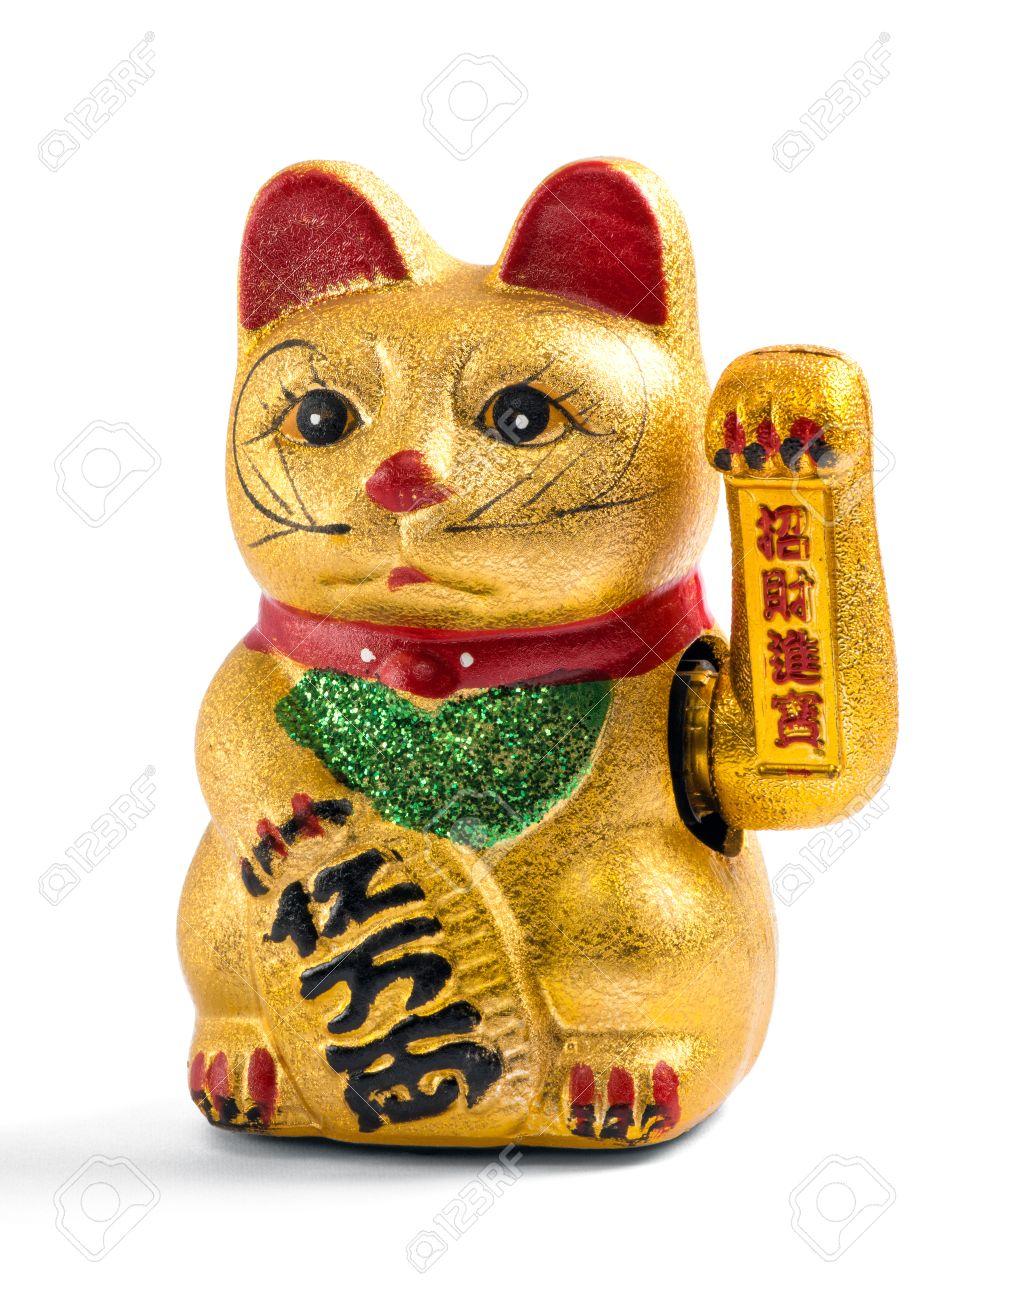 Asian prosperity charm